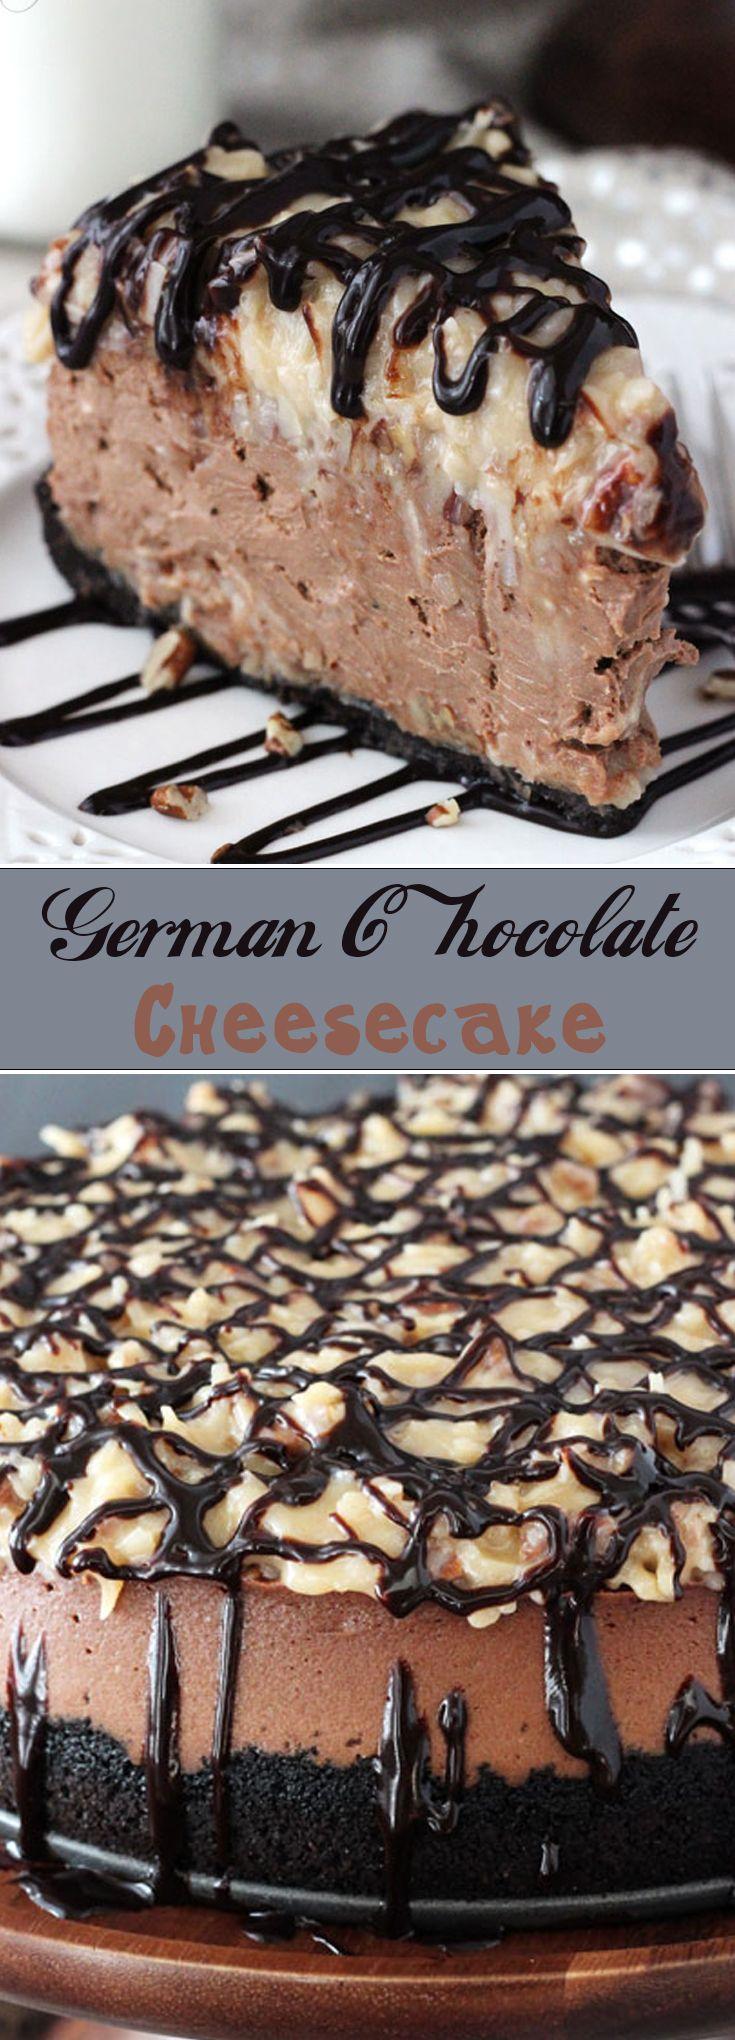 German Chocolate Cheesecake r2